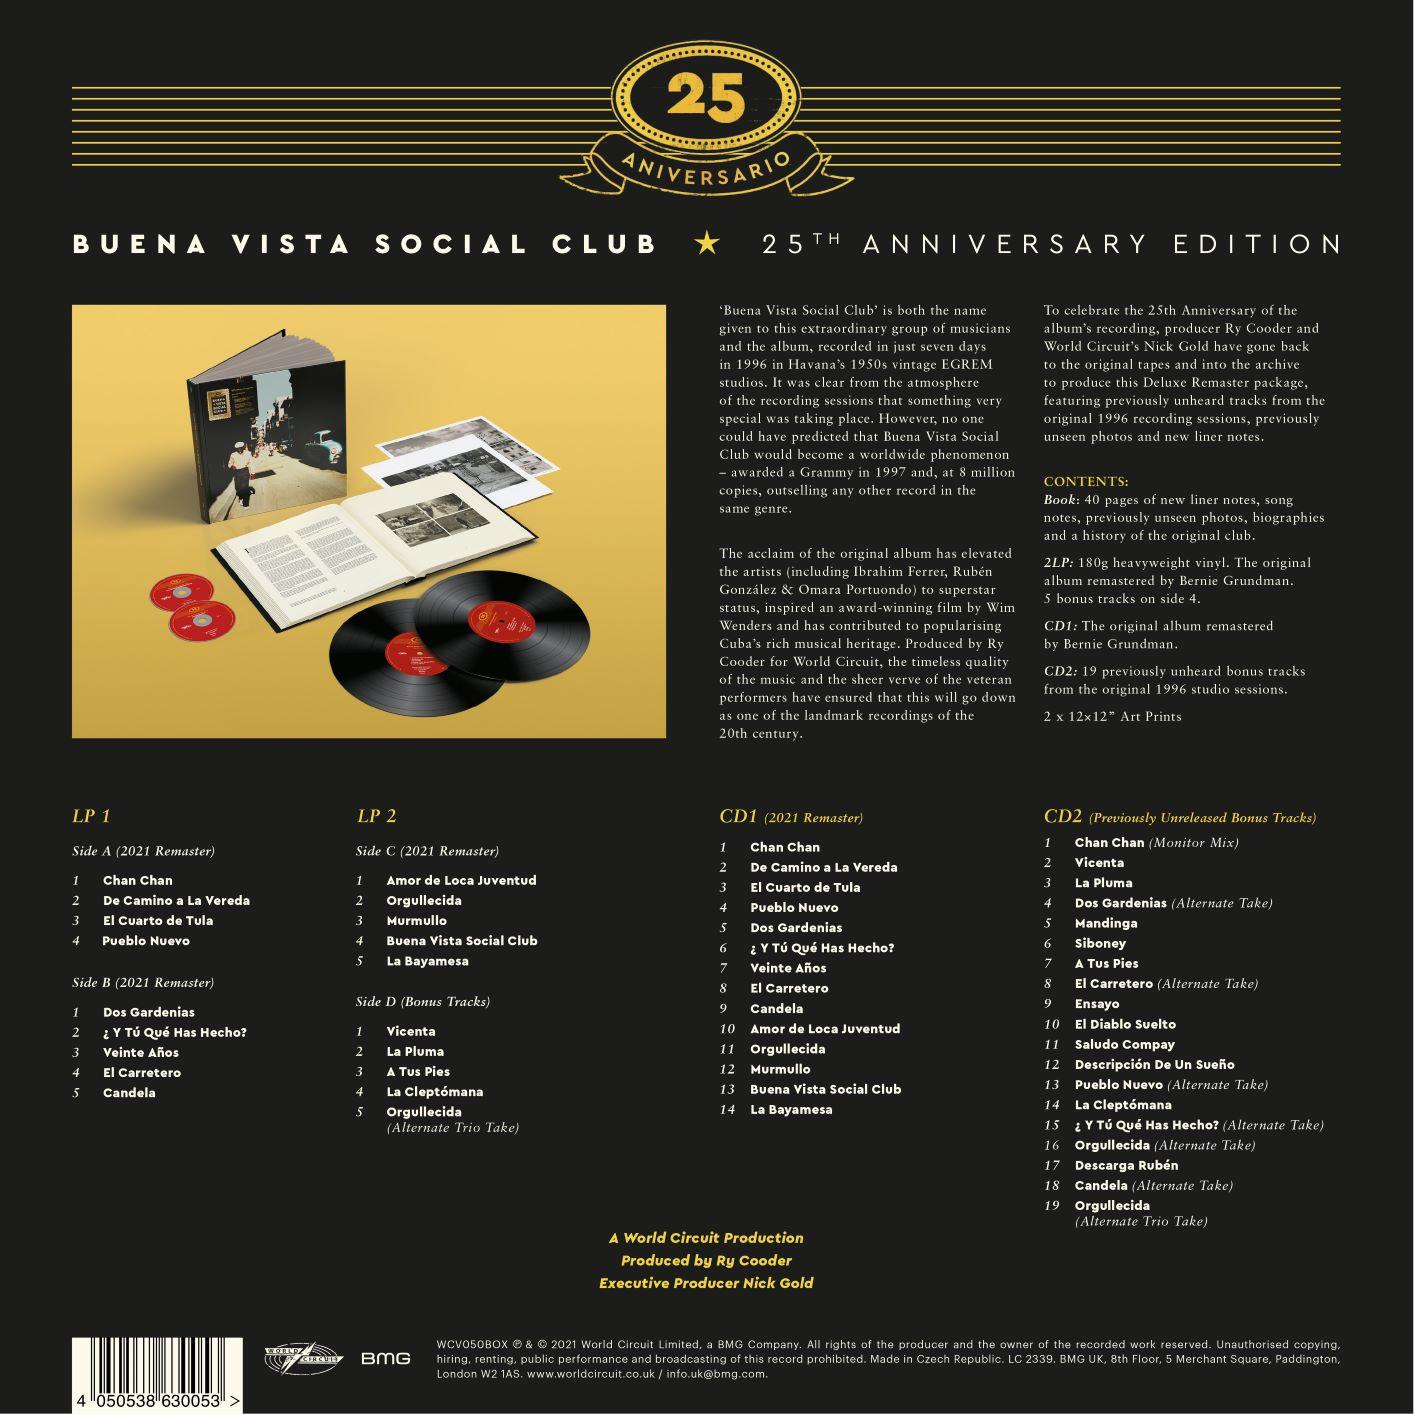 Buena Vista Social Club (25th Anniversary Edition)